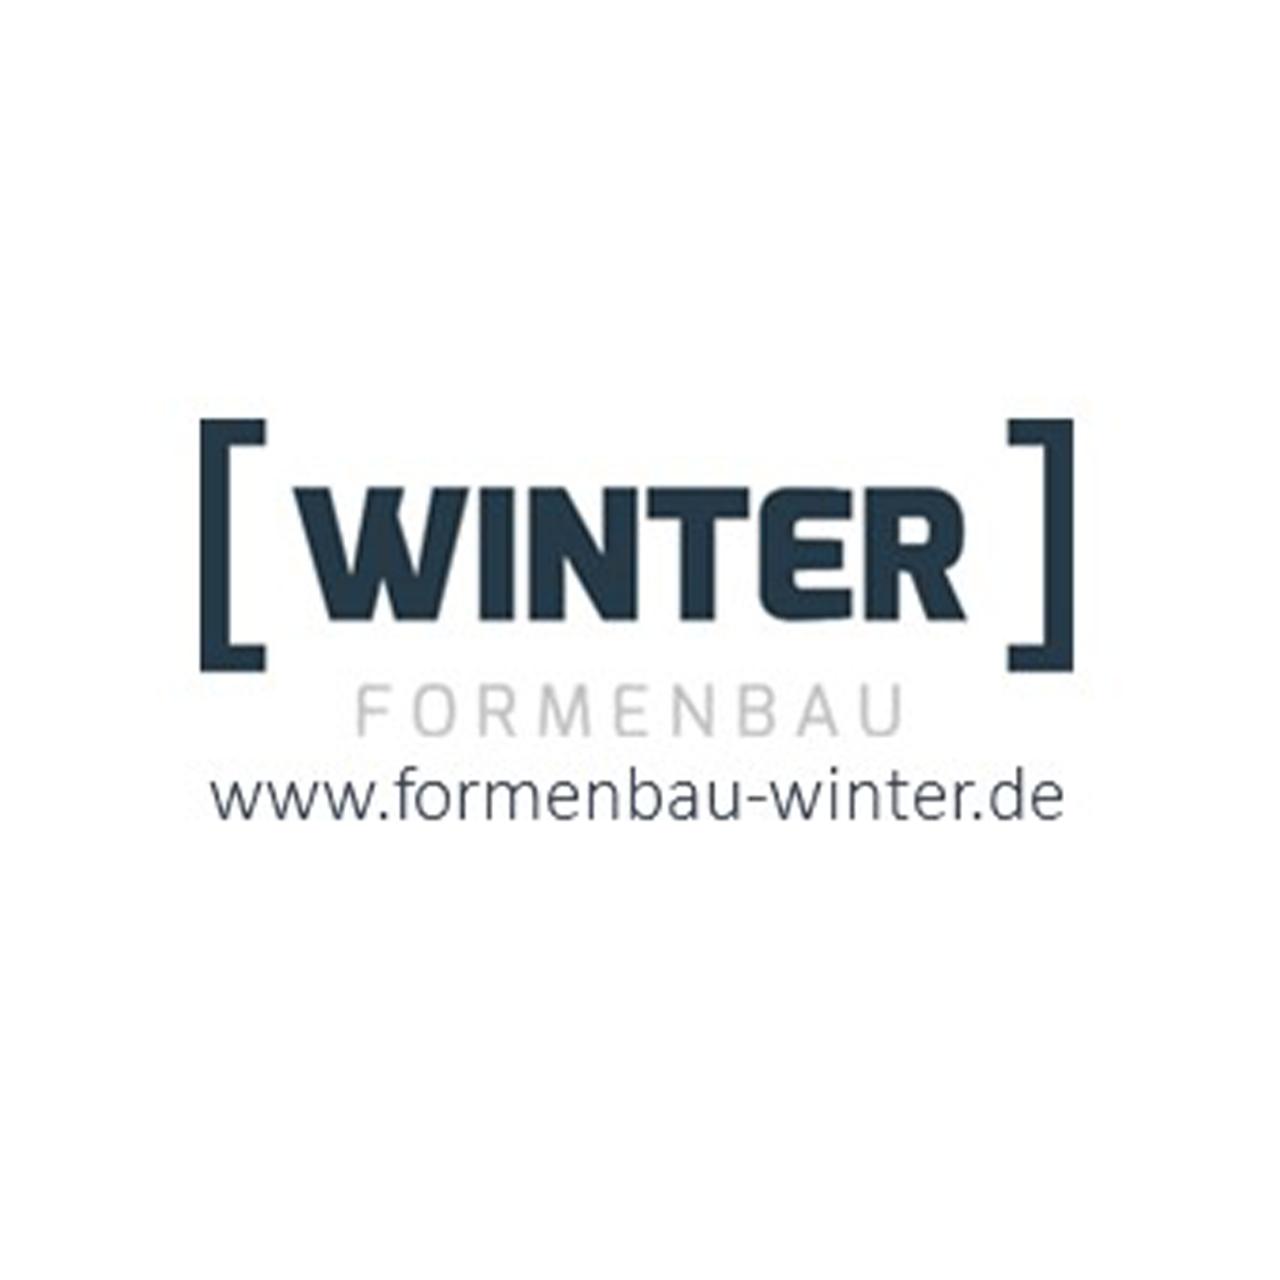 https://tuspopetershuette.de/wp-content/uploads/2020/02/VGH-1280x1280-1.png